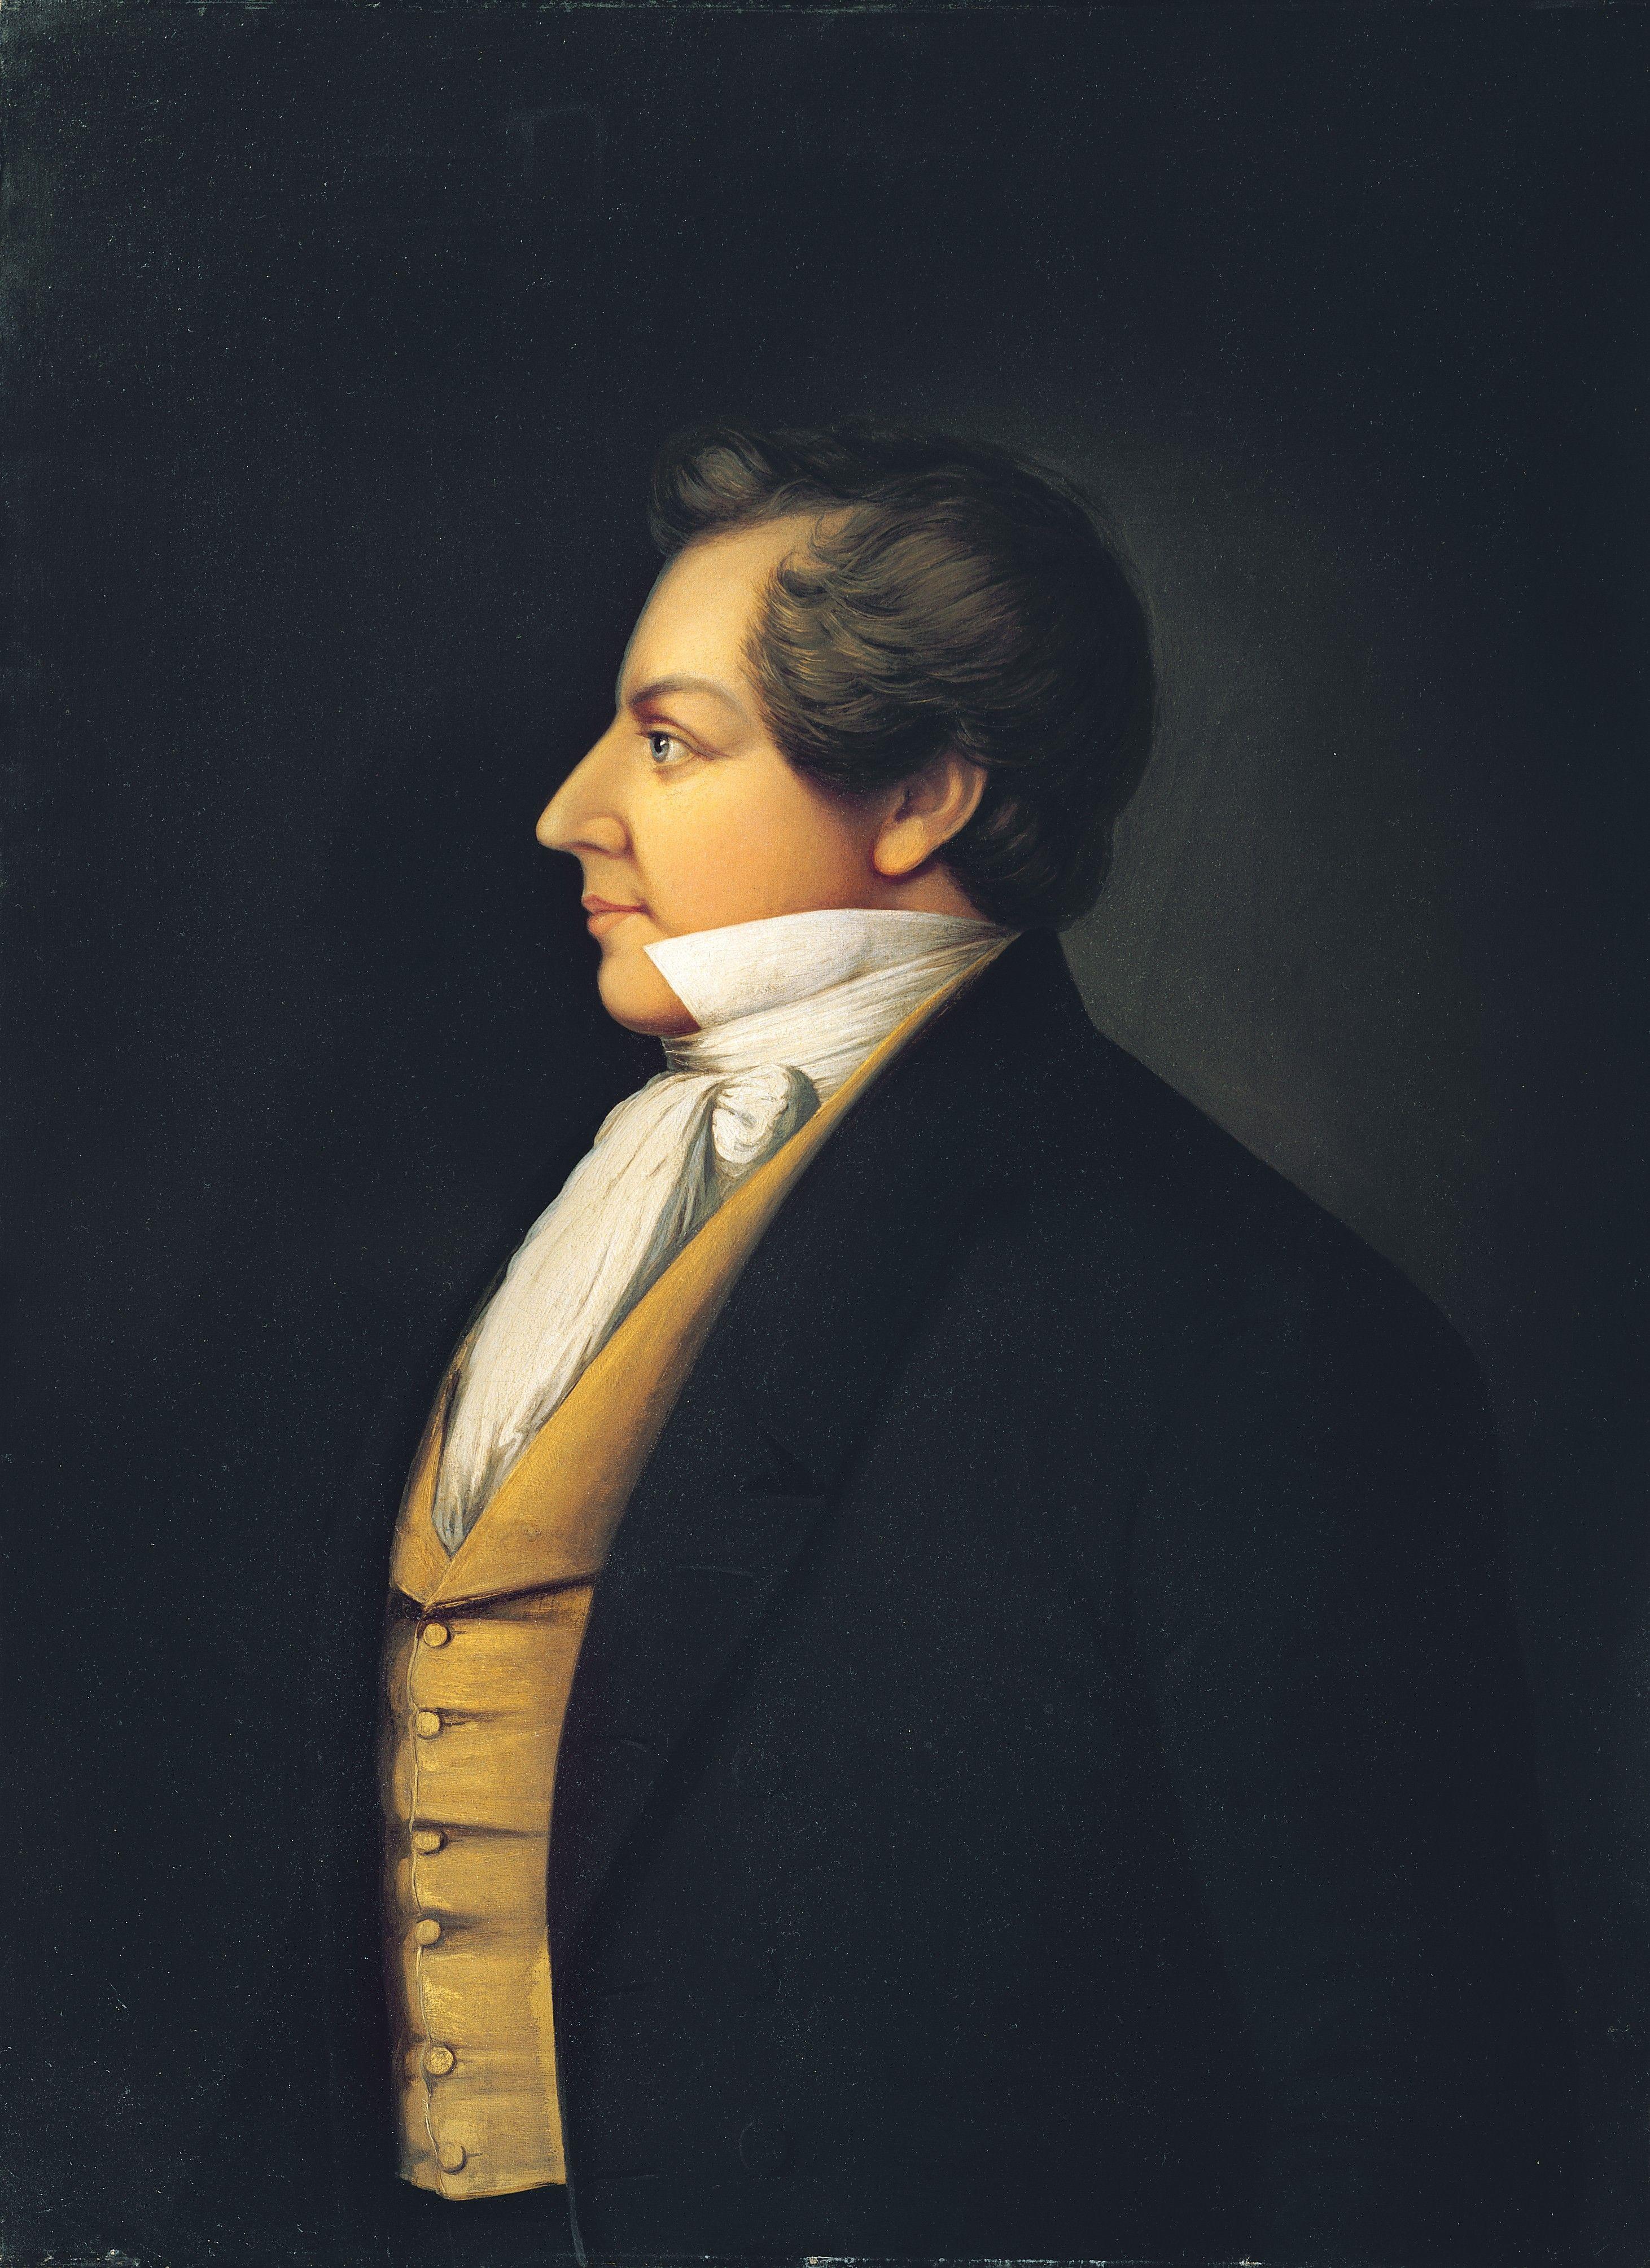 Joseph Smith, Jr., by Danquart Anthon Weggeland